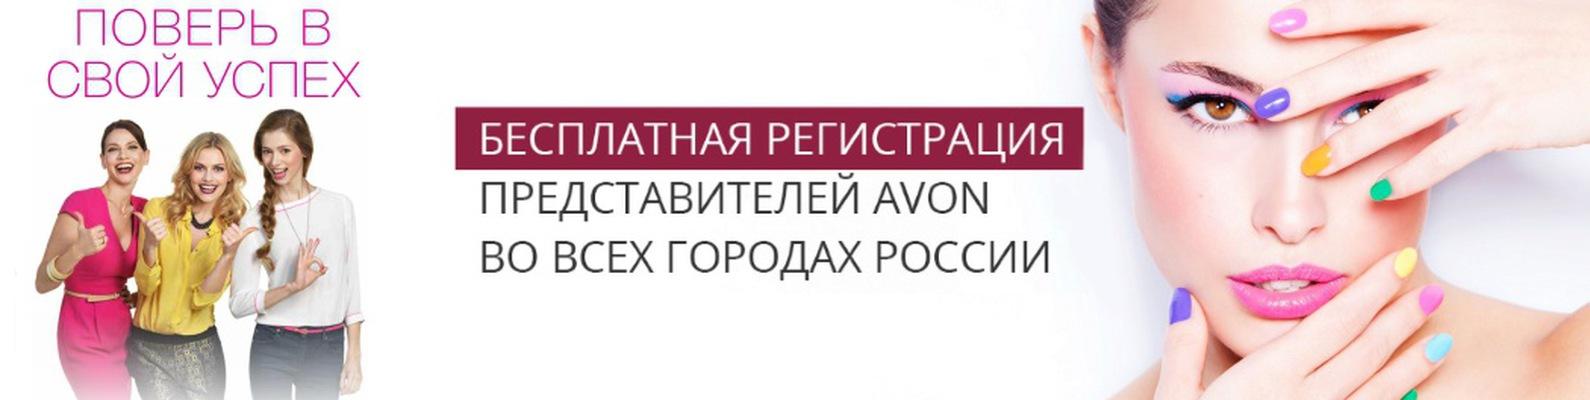 Avon онлайн регистрация косметика патанджали купить оптом